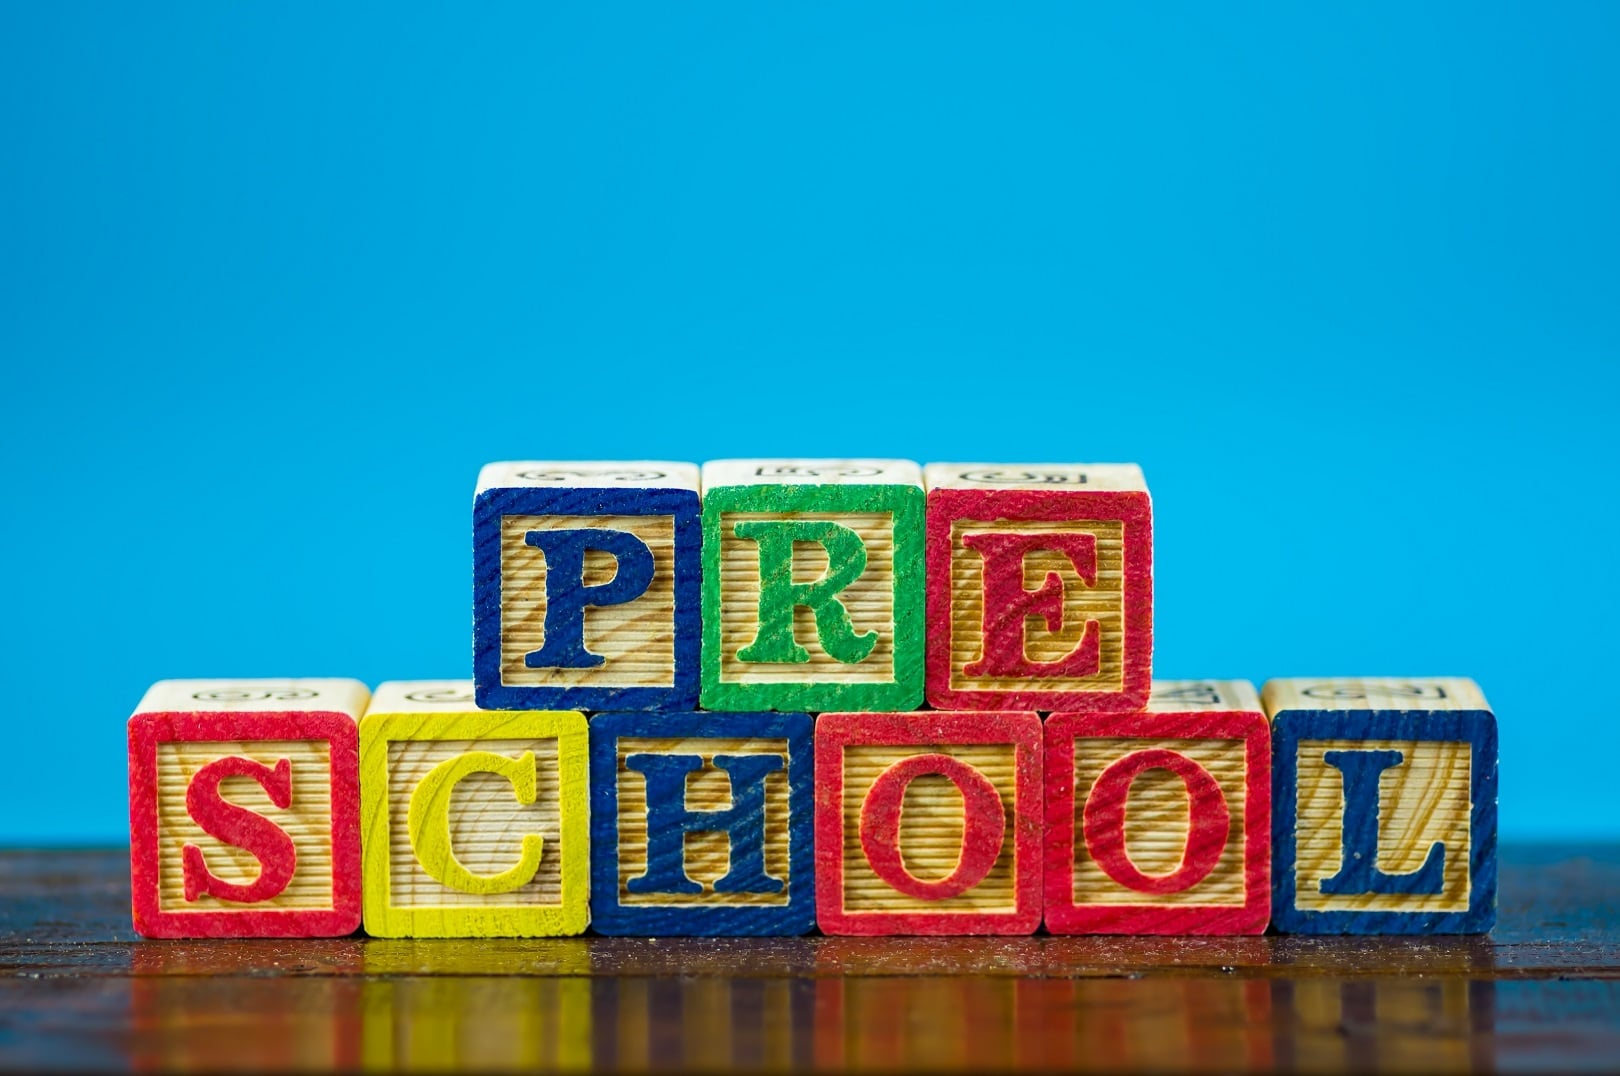 Find the 10 Preschools in Philadelphia - Find the 10 Preschools in Philadelphia